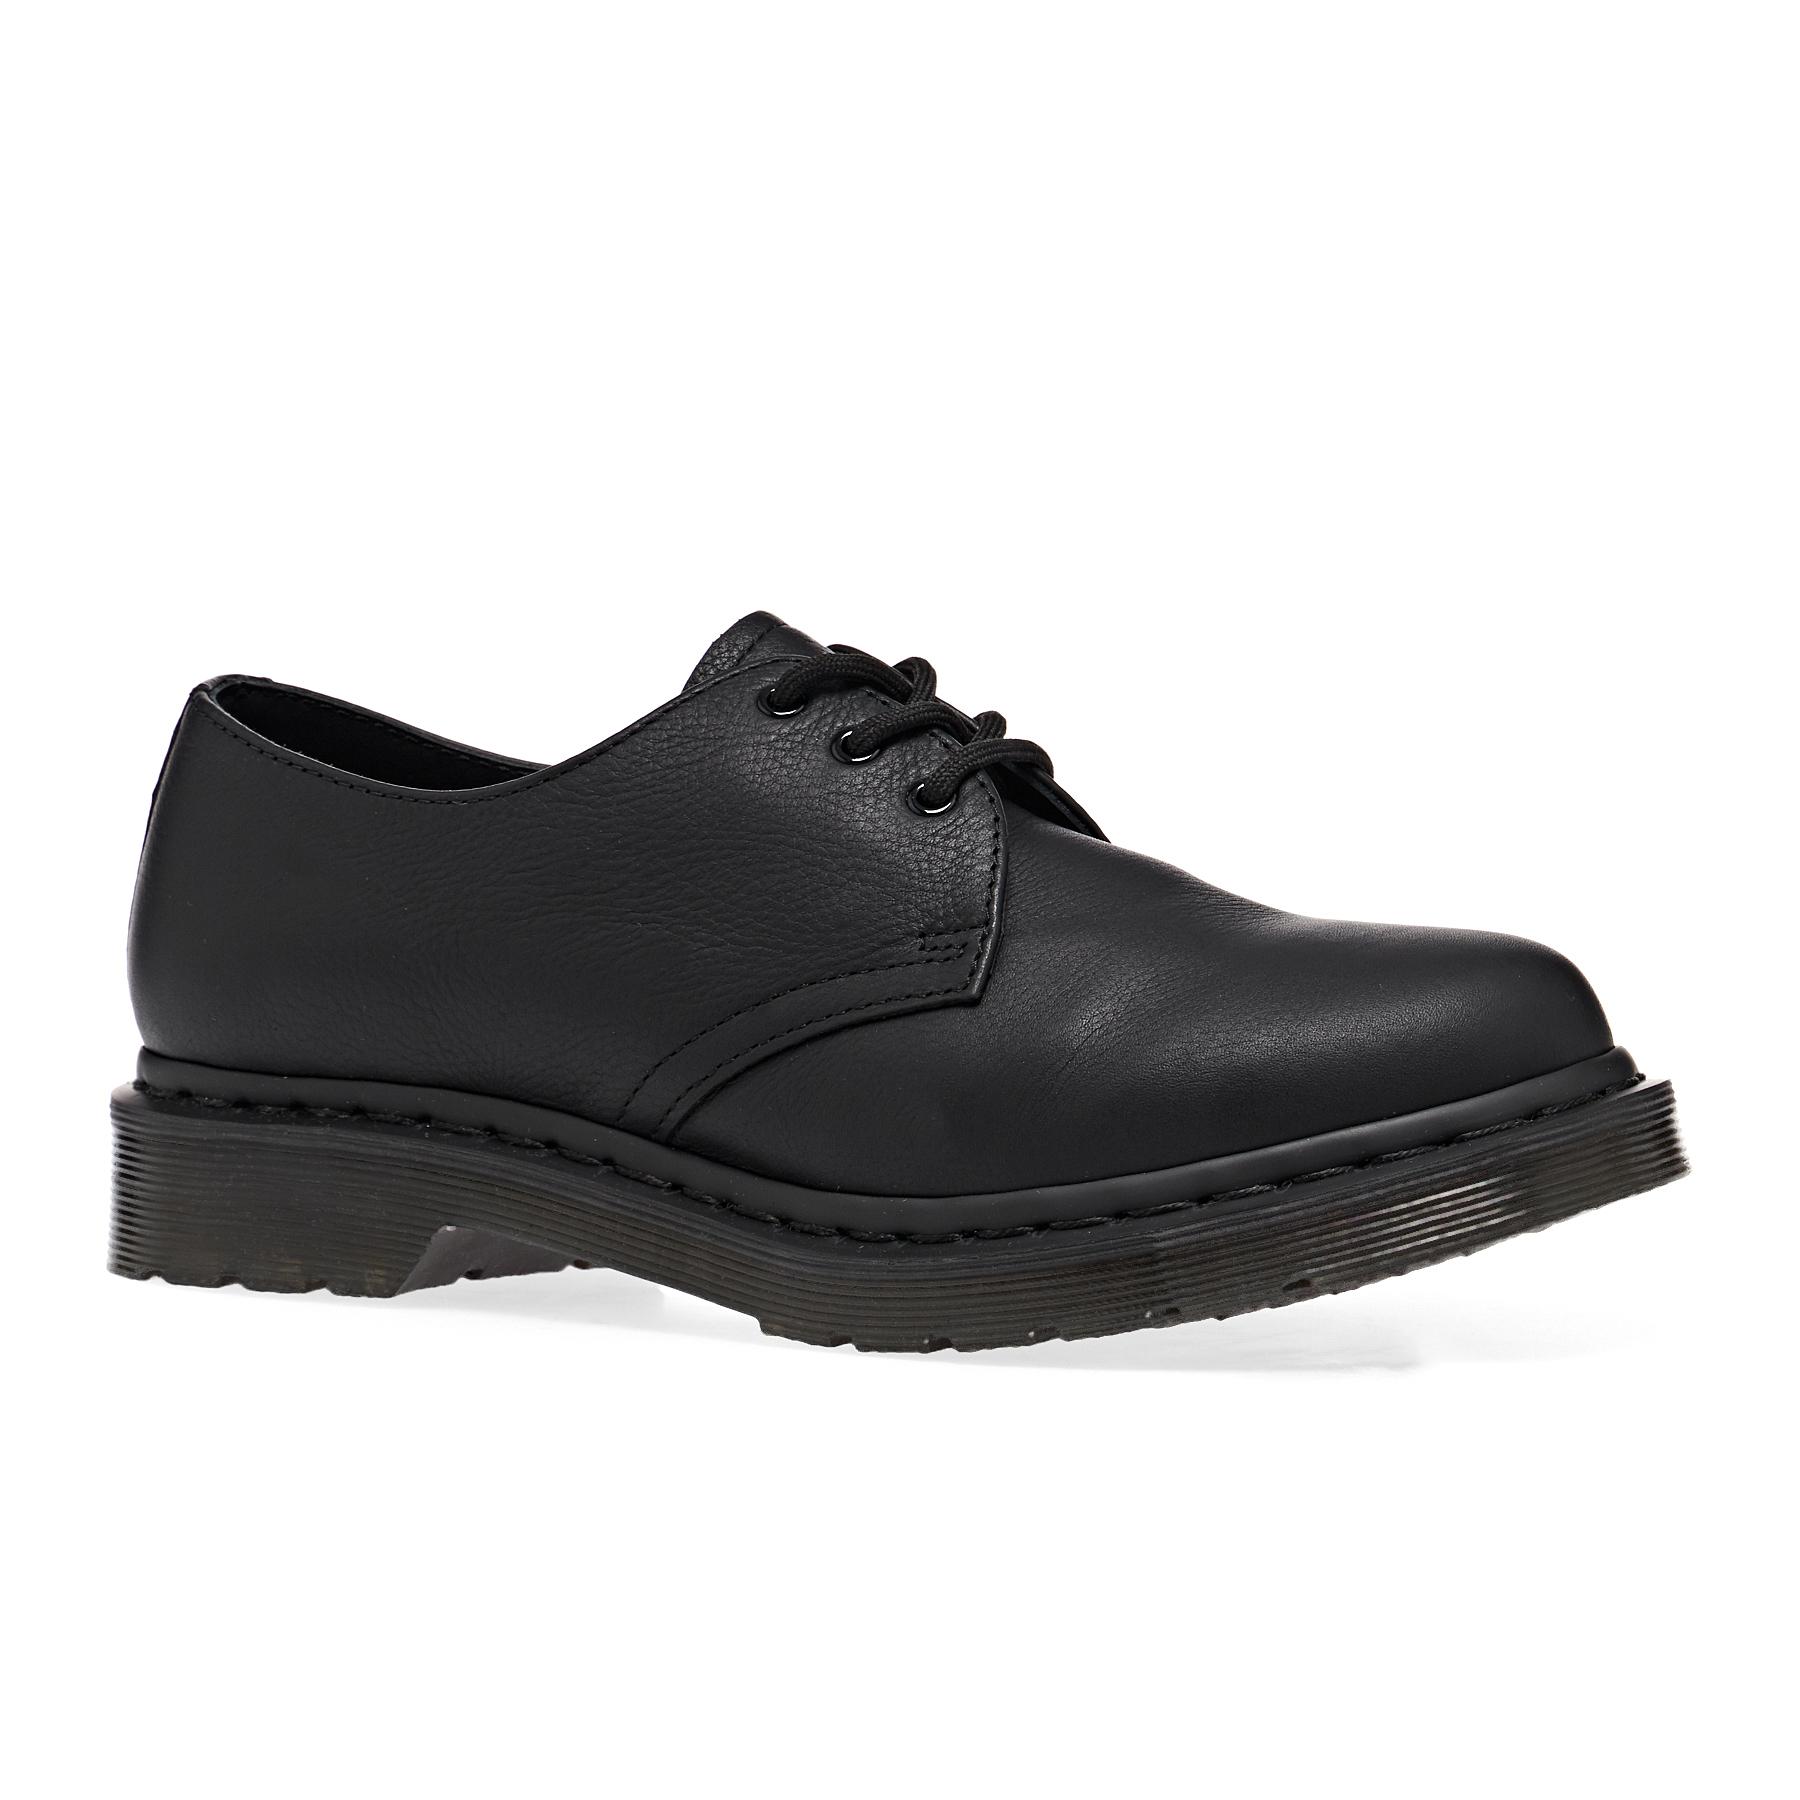 Dr Martens 1461 Virginia Shoes - Black